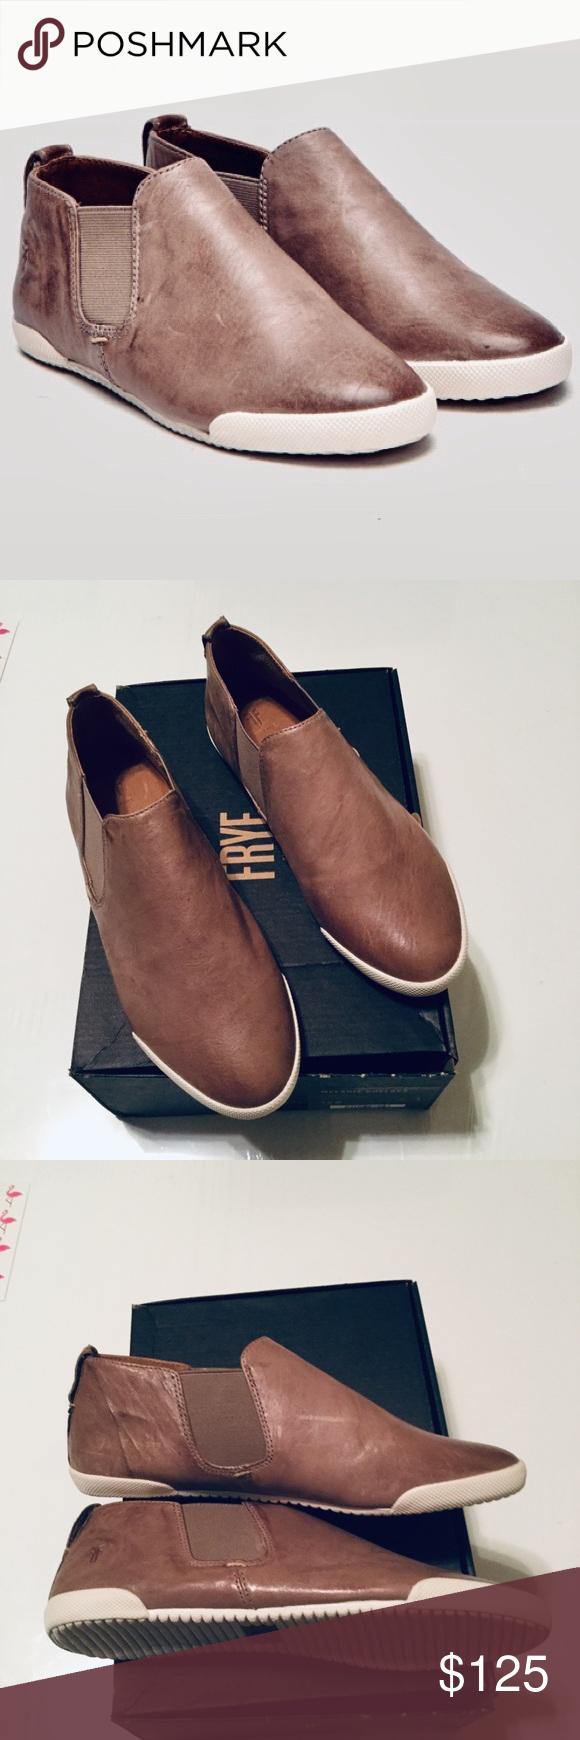 Frye Melanie Chelsea Boot Size 7.5M